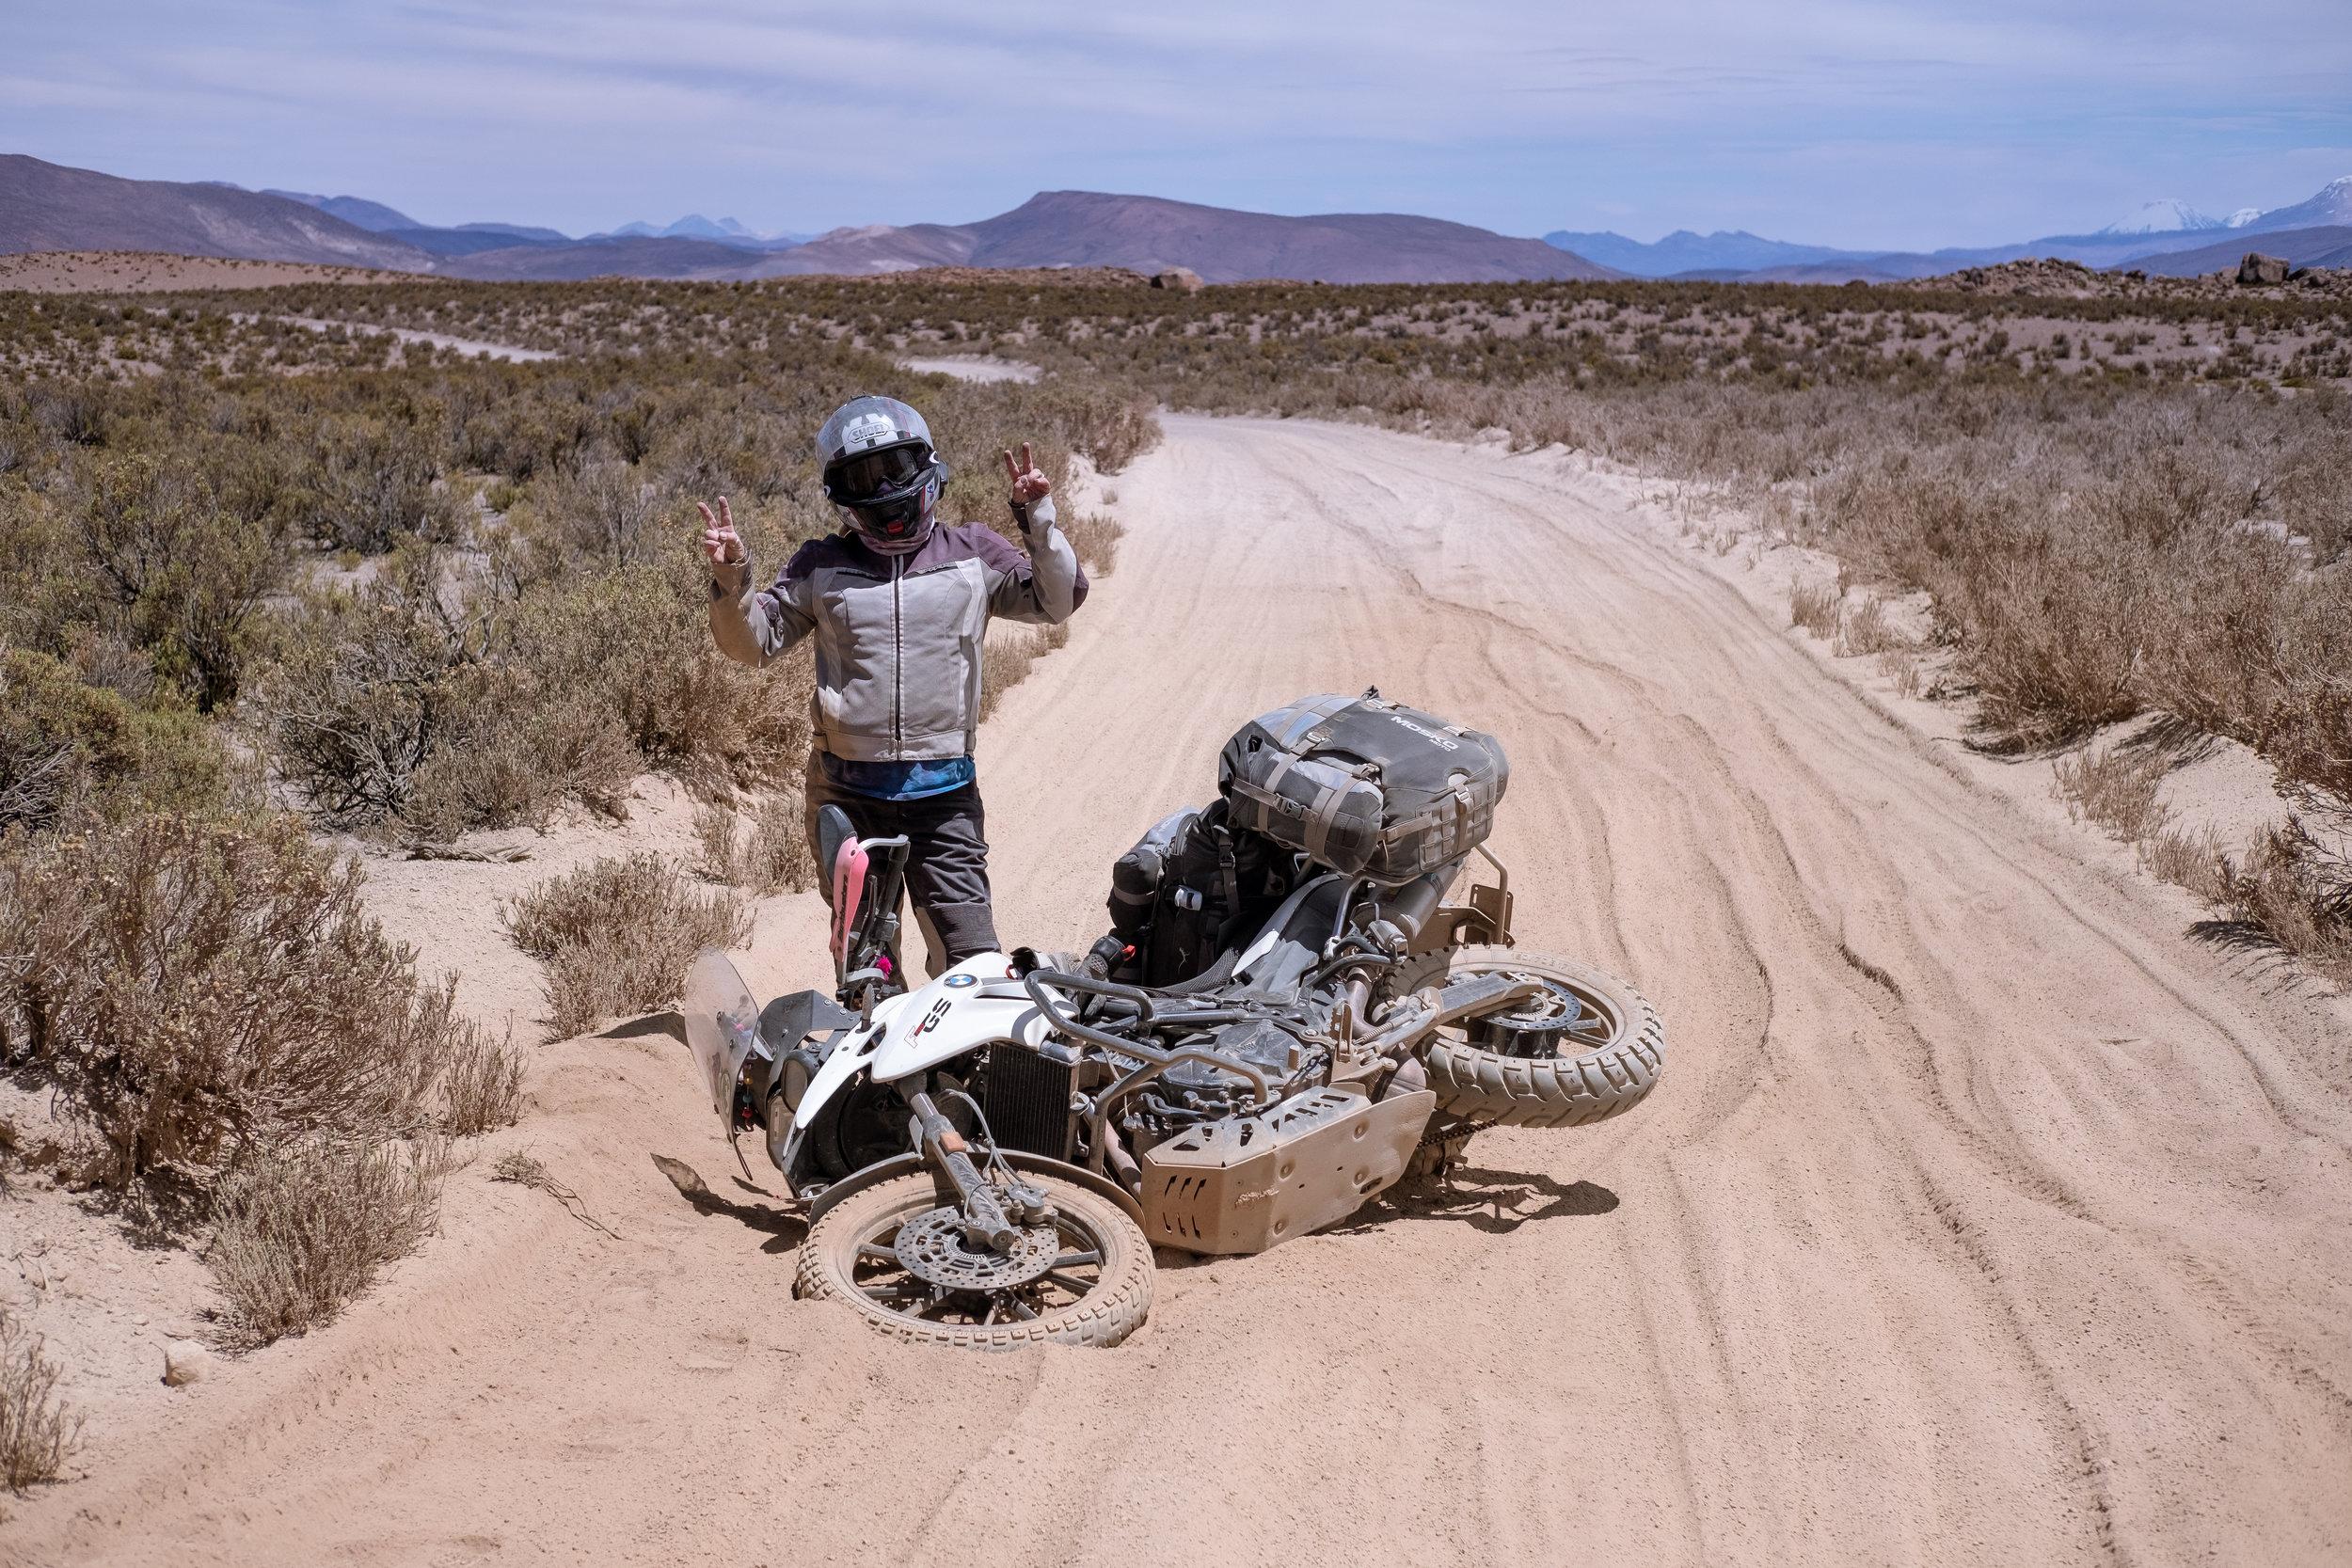 Paul-Neake-Hannaby-Adventure-Rider-Radio-Motorcycle-Podcast-1.jpg